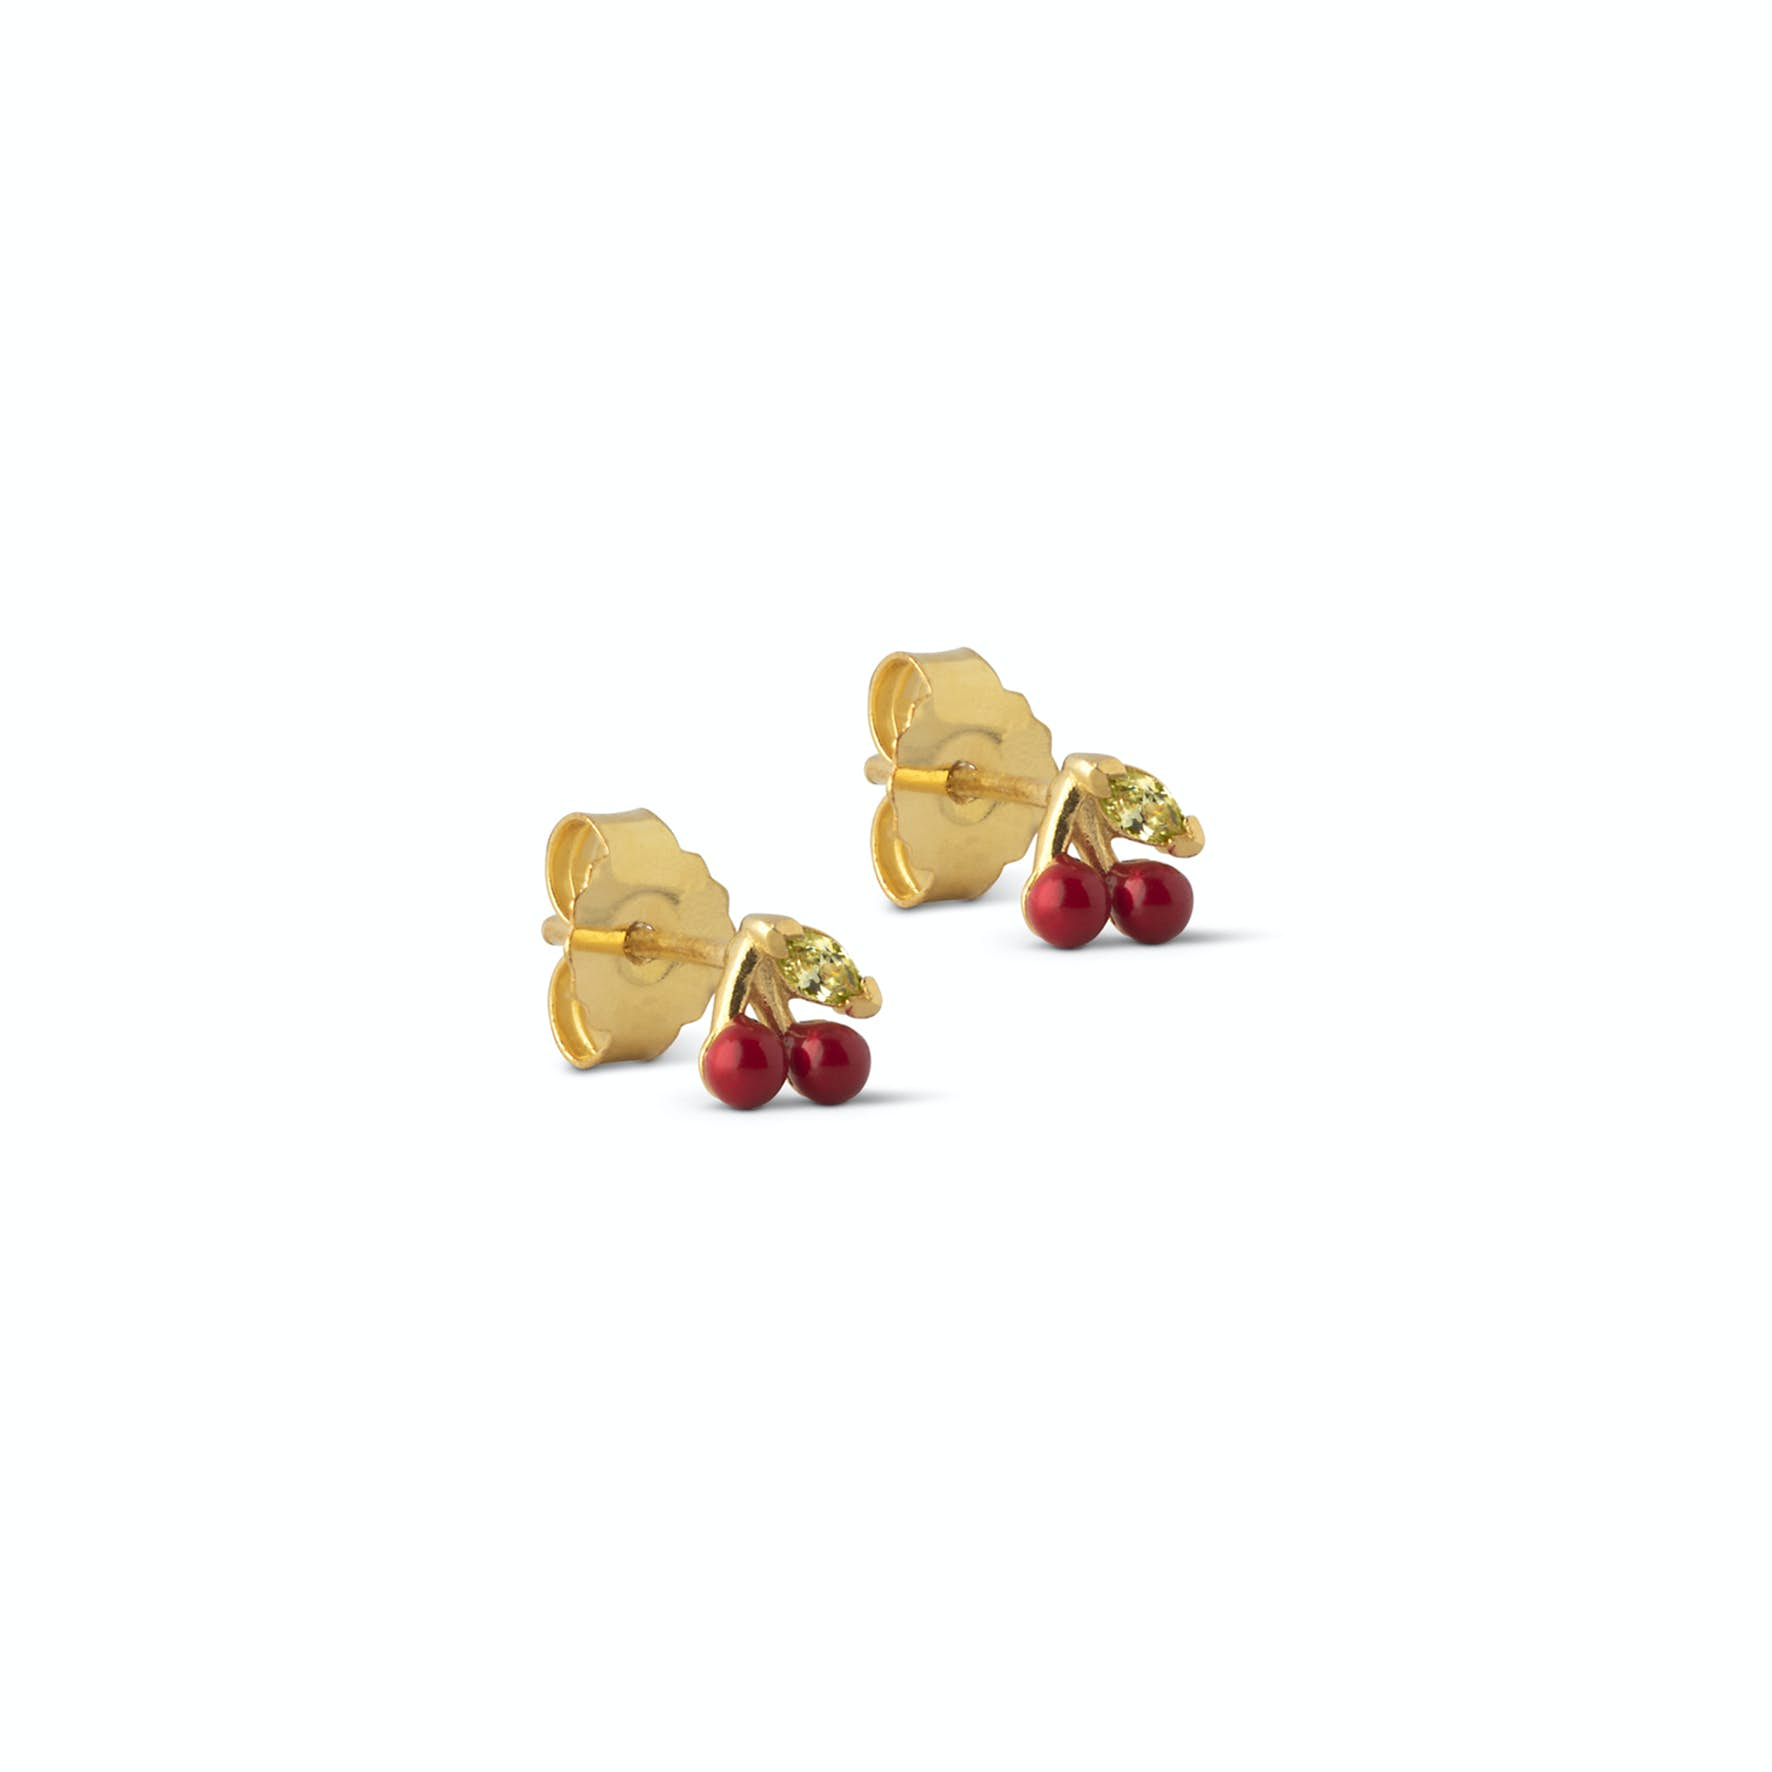 Cherry Studs Red from Enamel Copenhagen in Goldplated-Silver Sterling 925